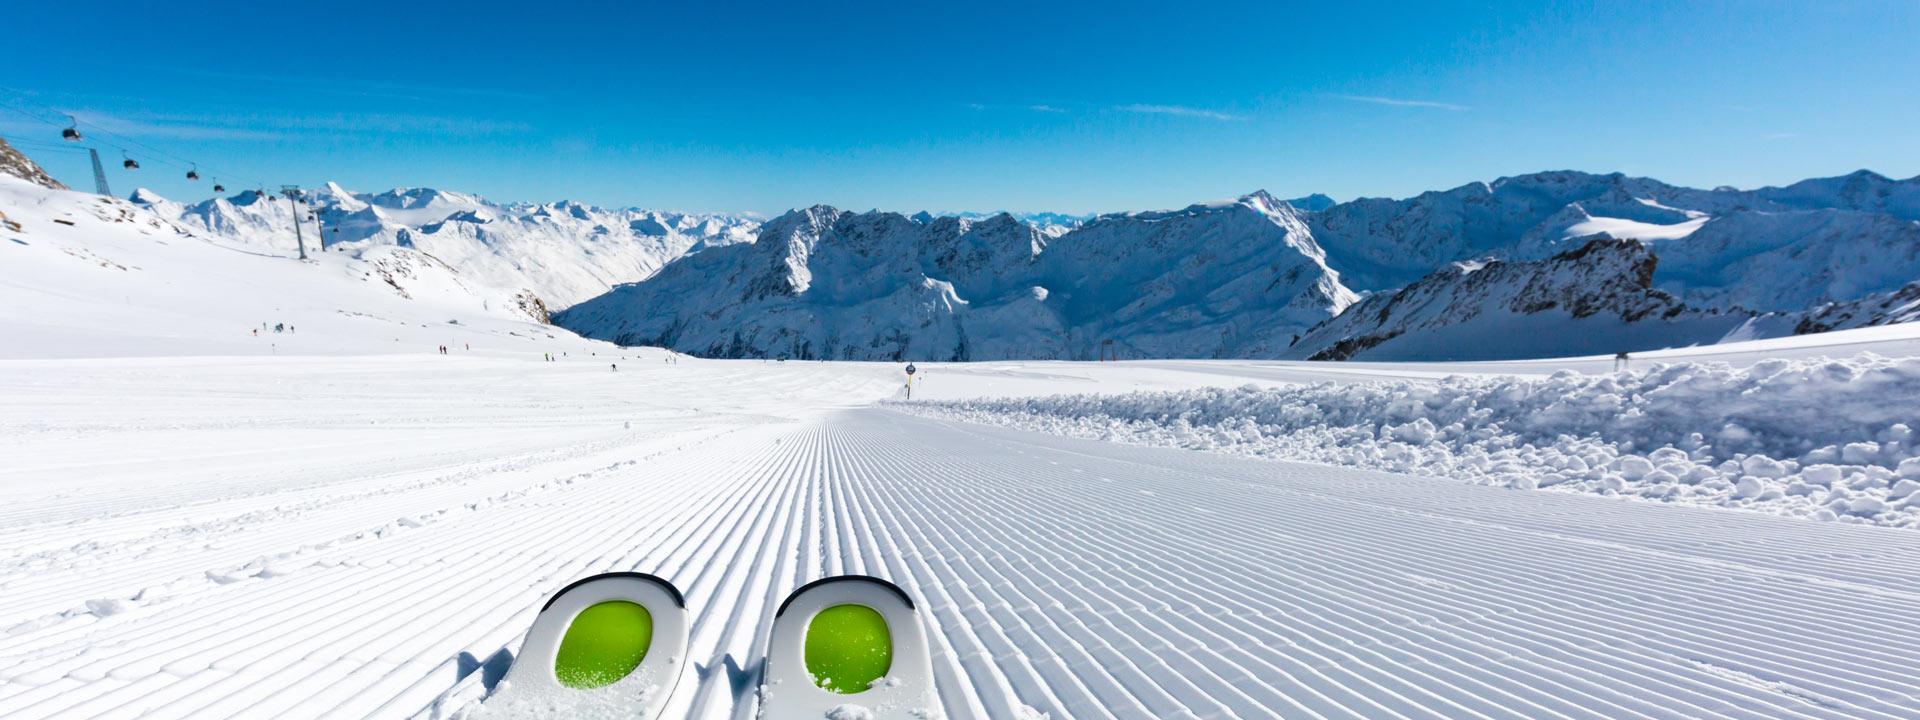 skiurlaub-direkt-skipiste